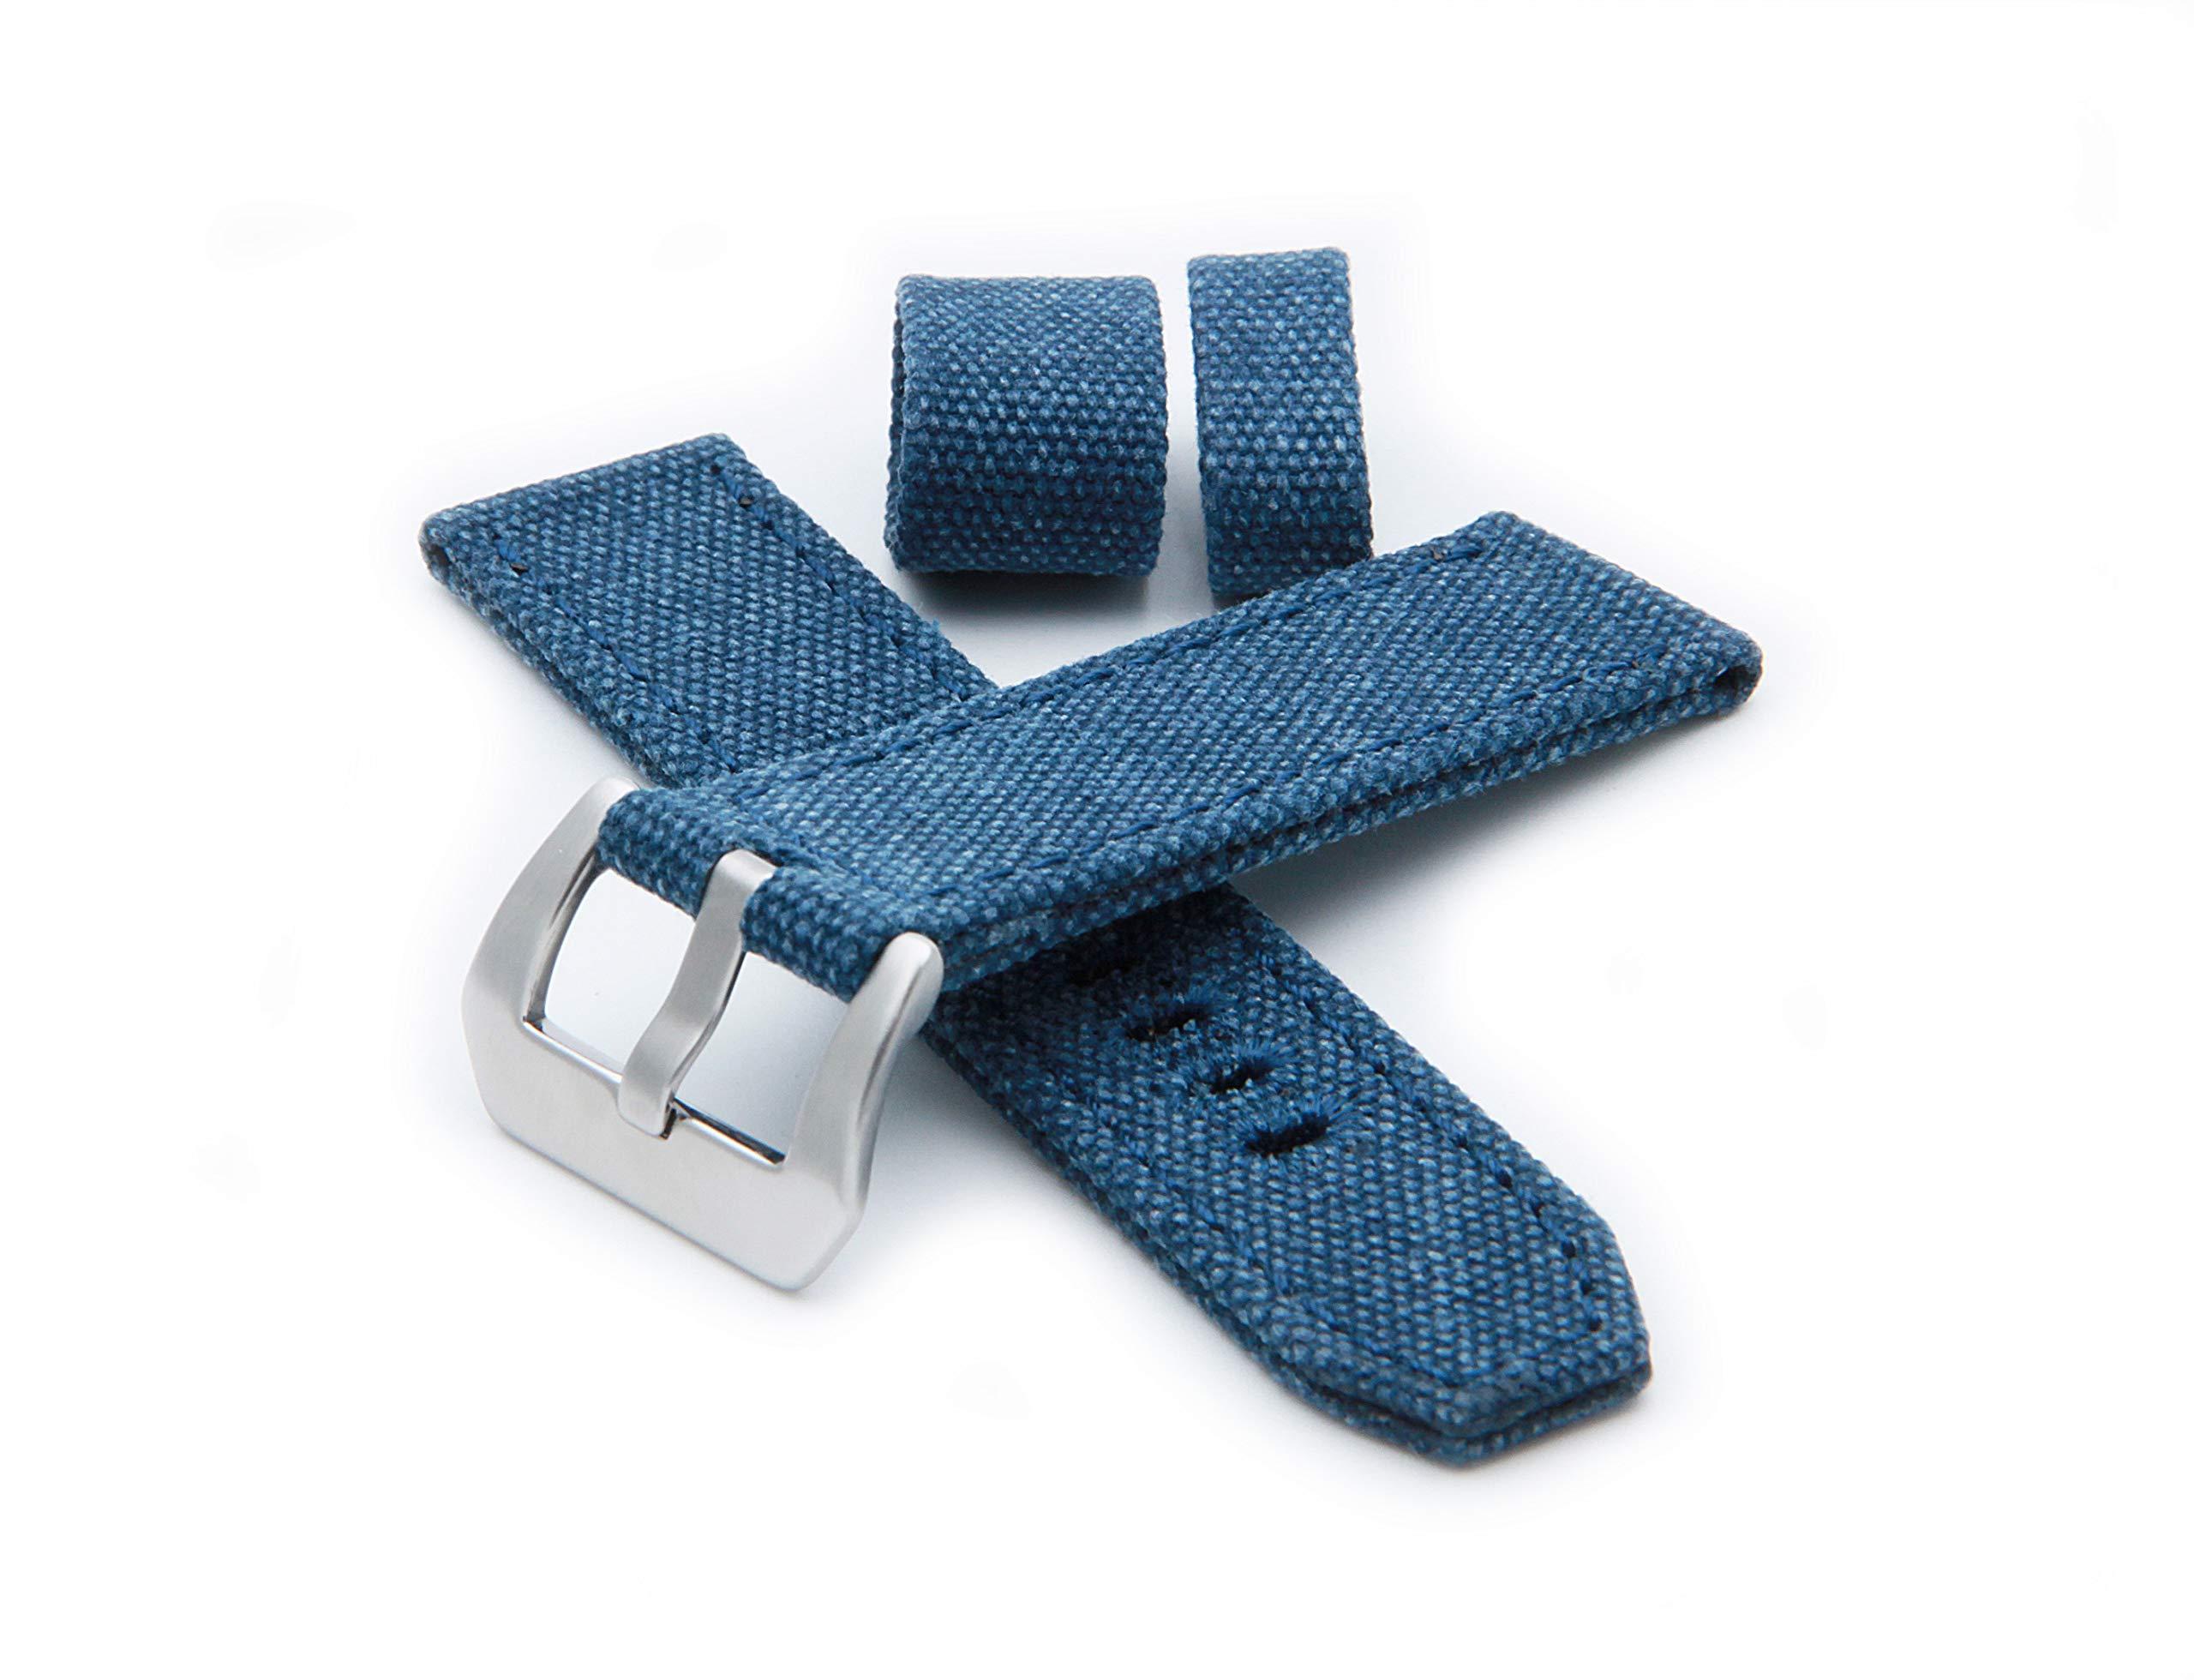 Helm Watches CS1 Canvas Watch Strap - Blue (22mm)